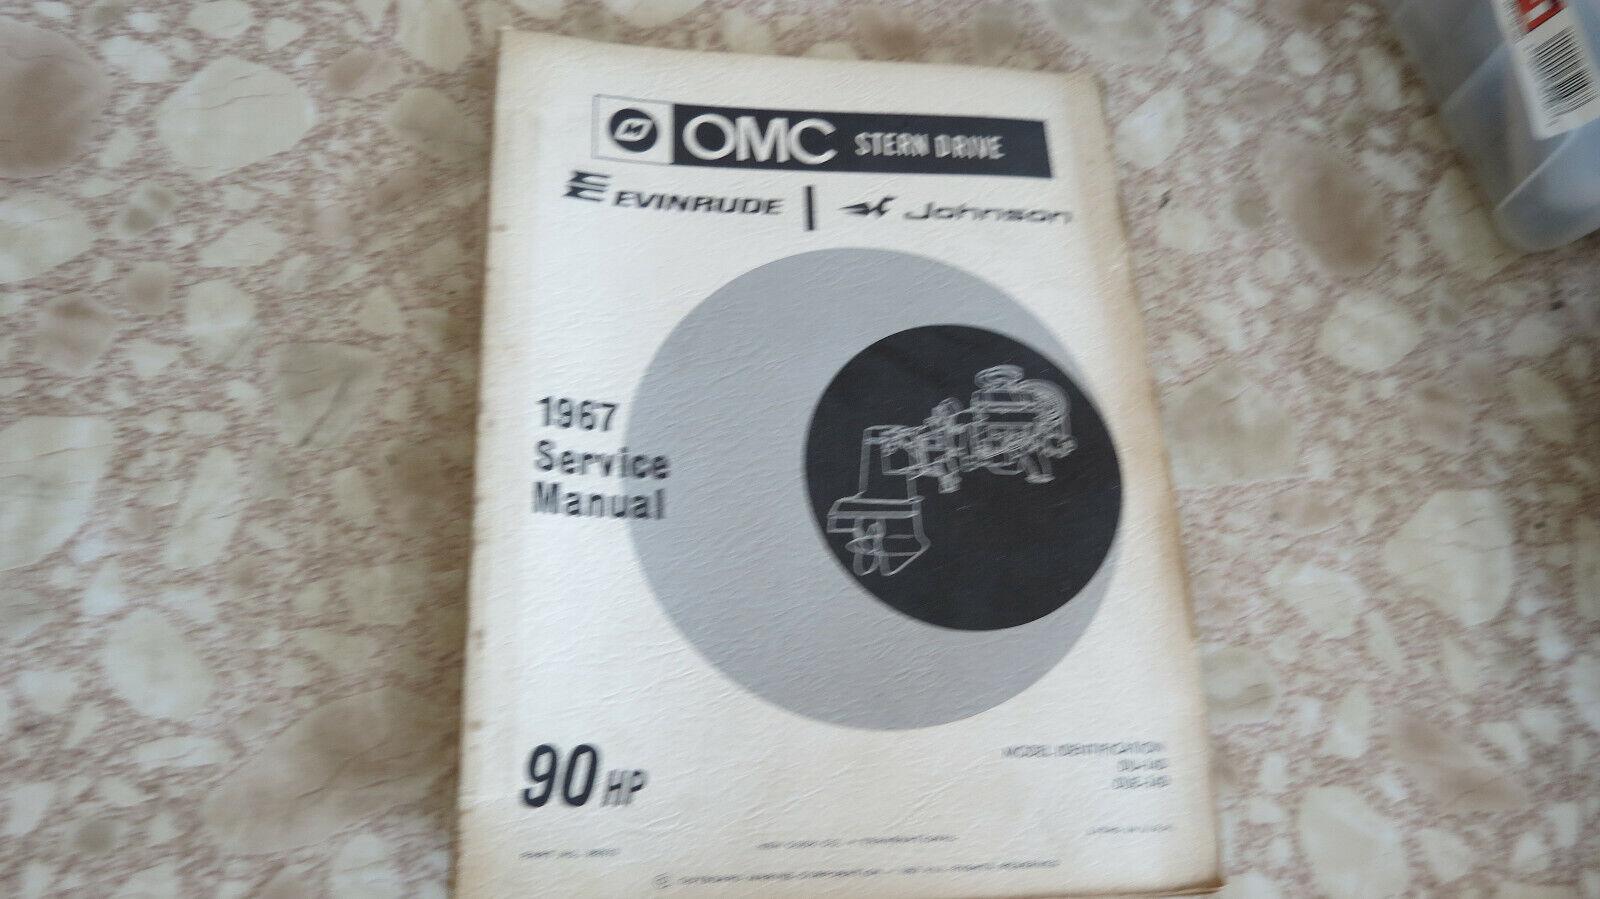 1967 OMC Stern Drive Evinrude Johnson 90HP Service Manual DU-14D DUE-14D